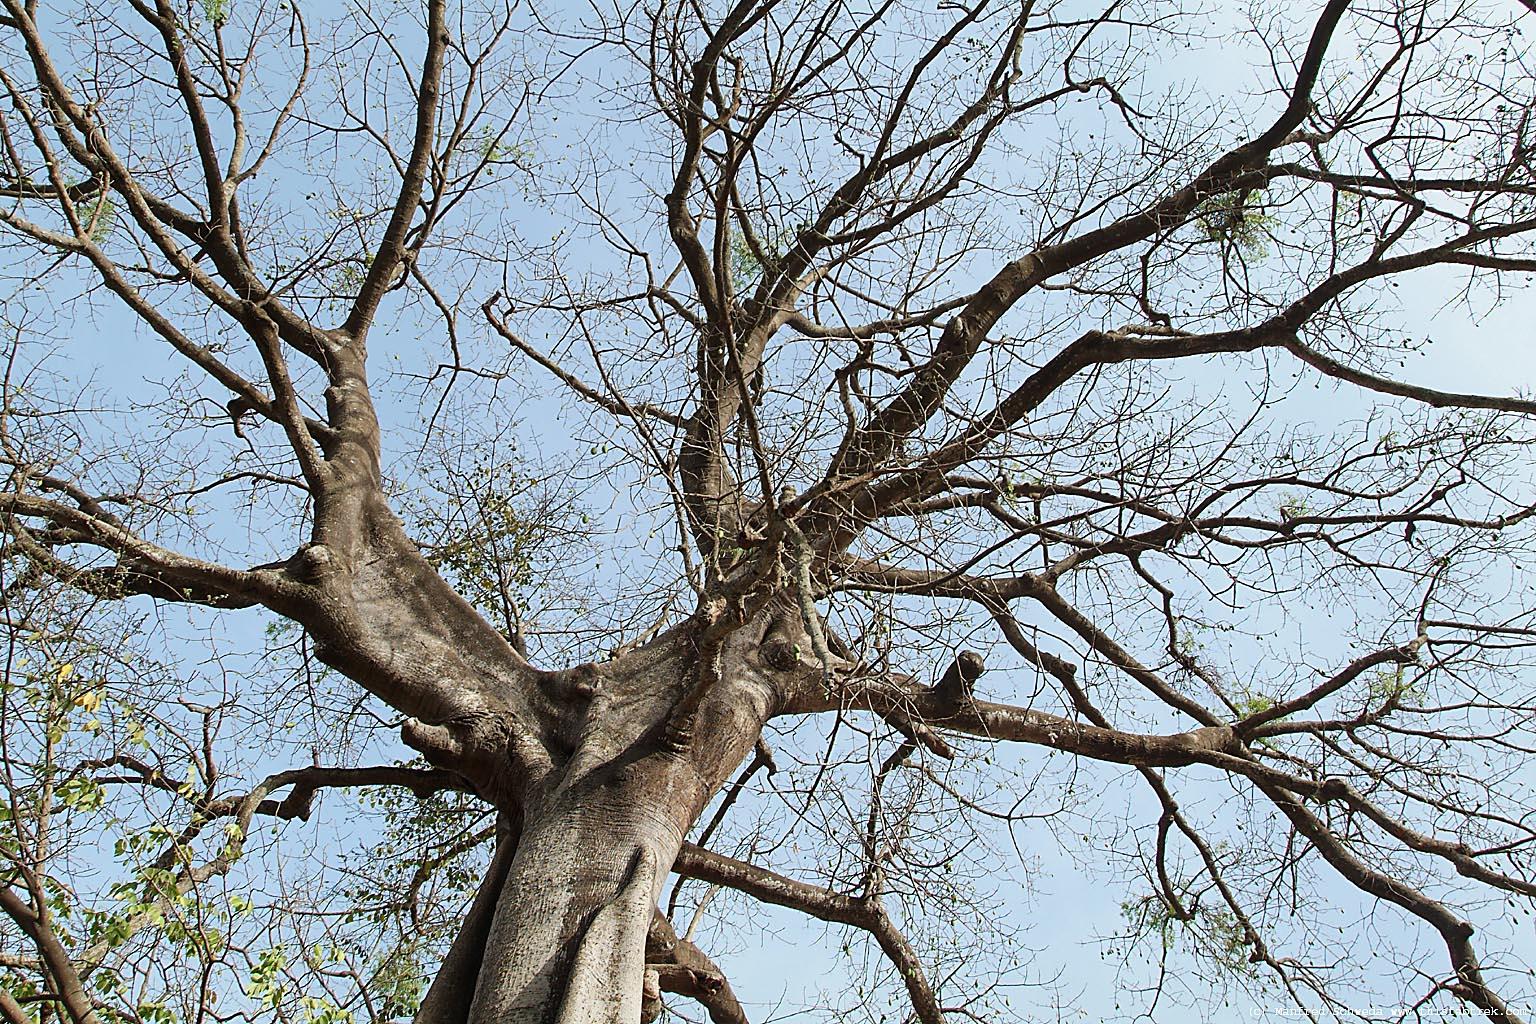 http://www.thisfabtrek.com/journey/africa/senegal-gambia/20080306-djembering/fromager-silk-cotton-tree-senegal-4.jpg